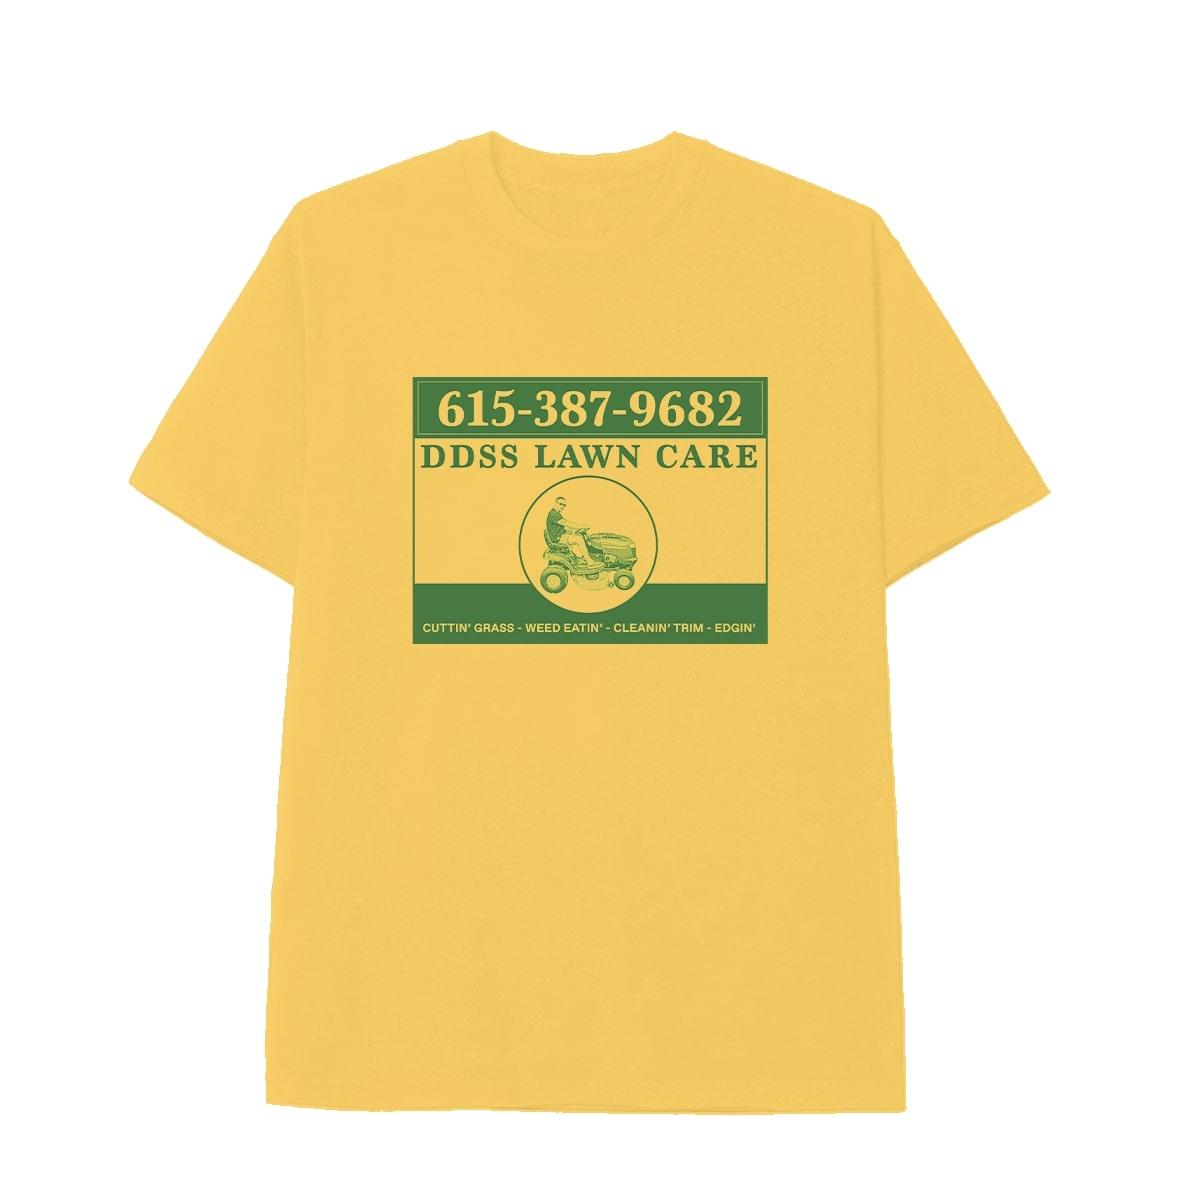 DDSS Lawn Care T-Shirt